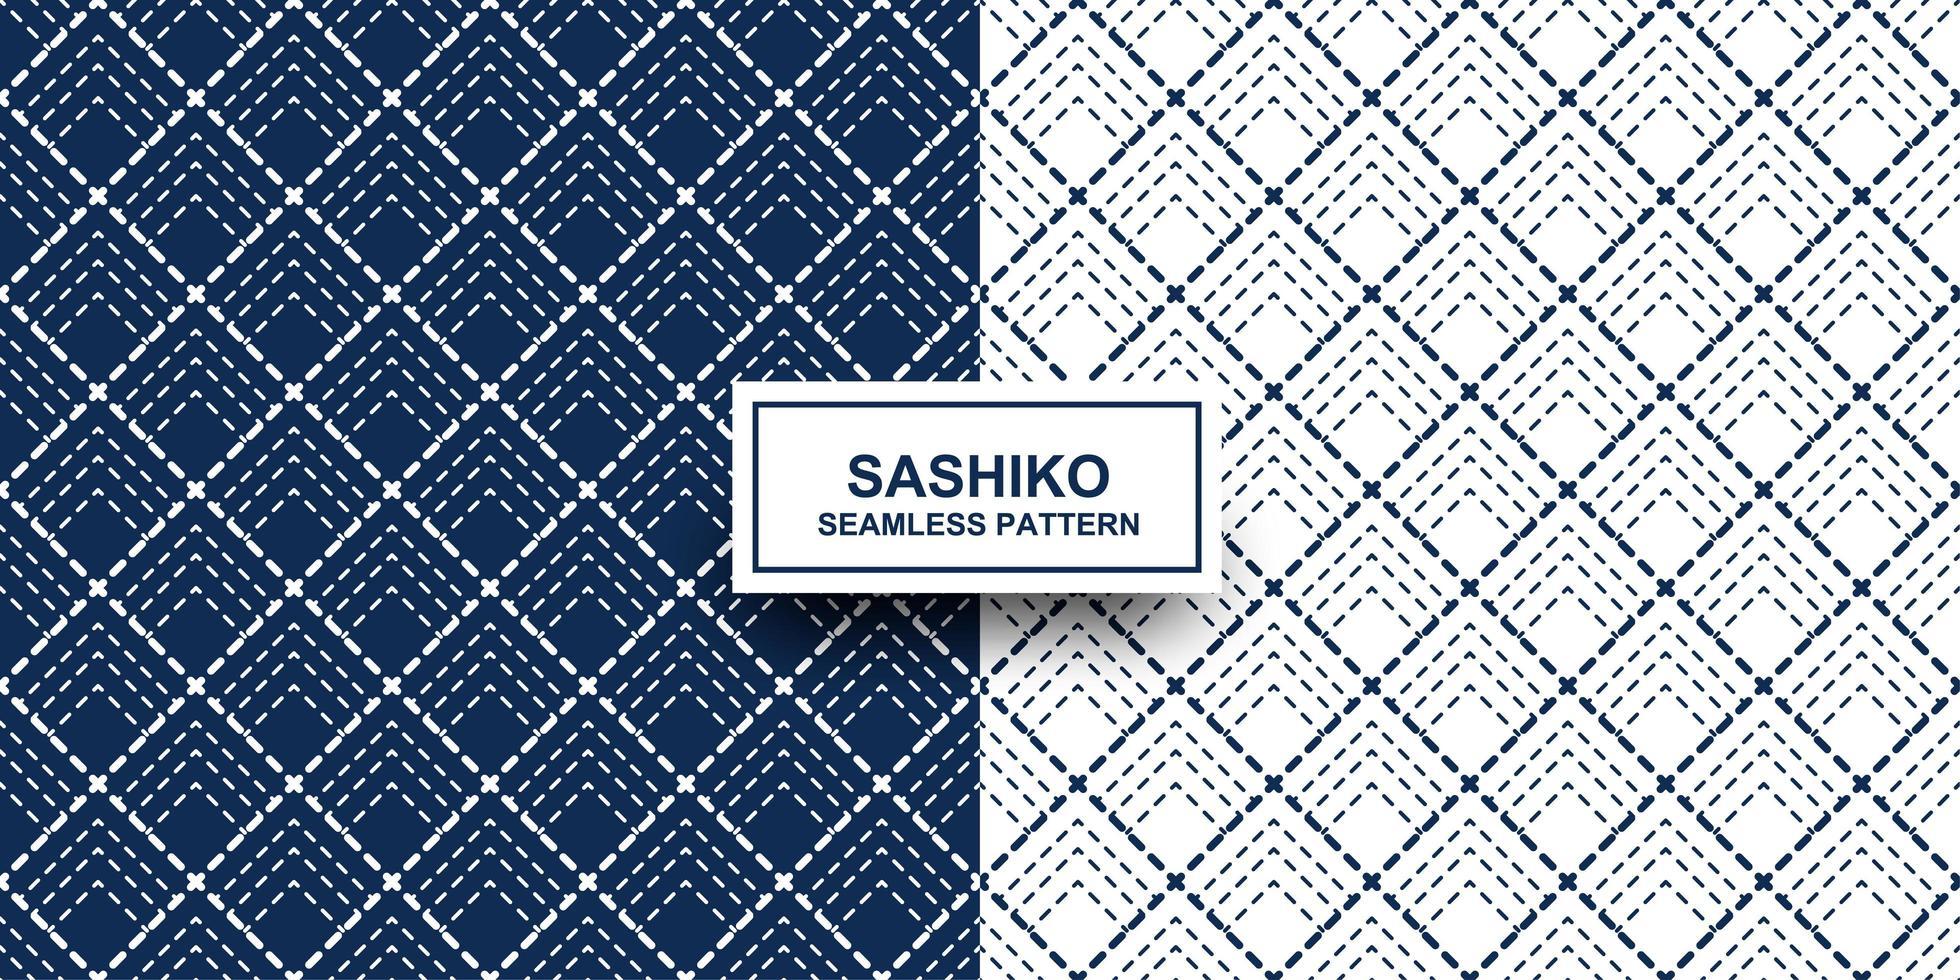 indigo en witte sashiko naadloze patroon set vector